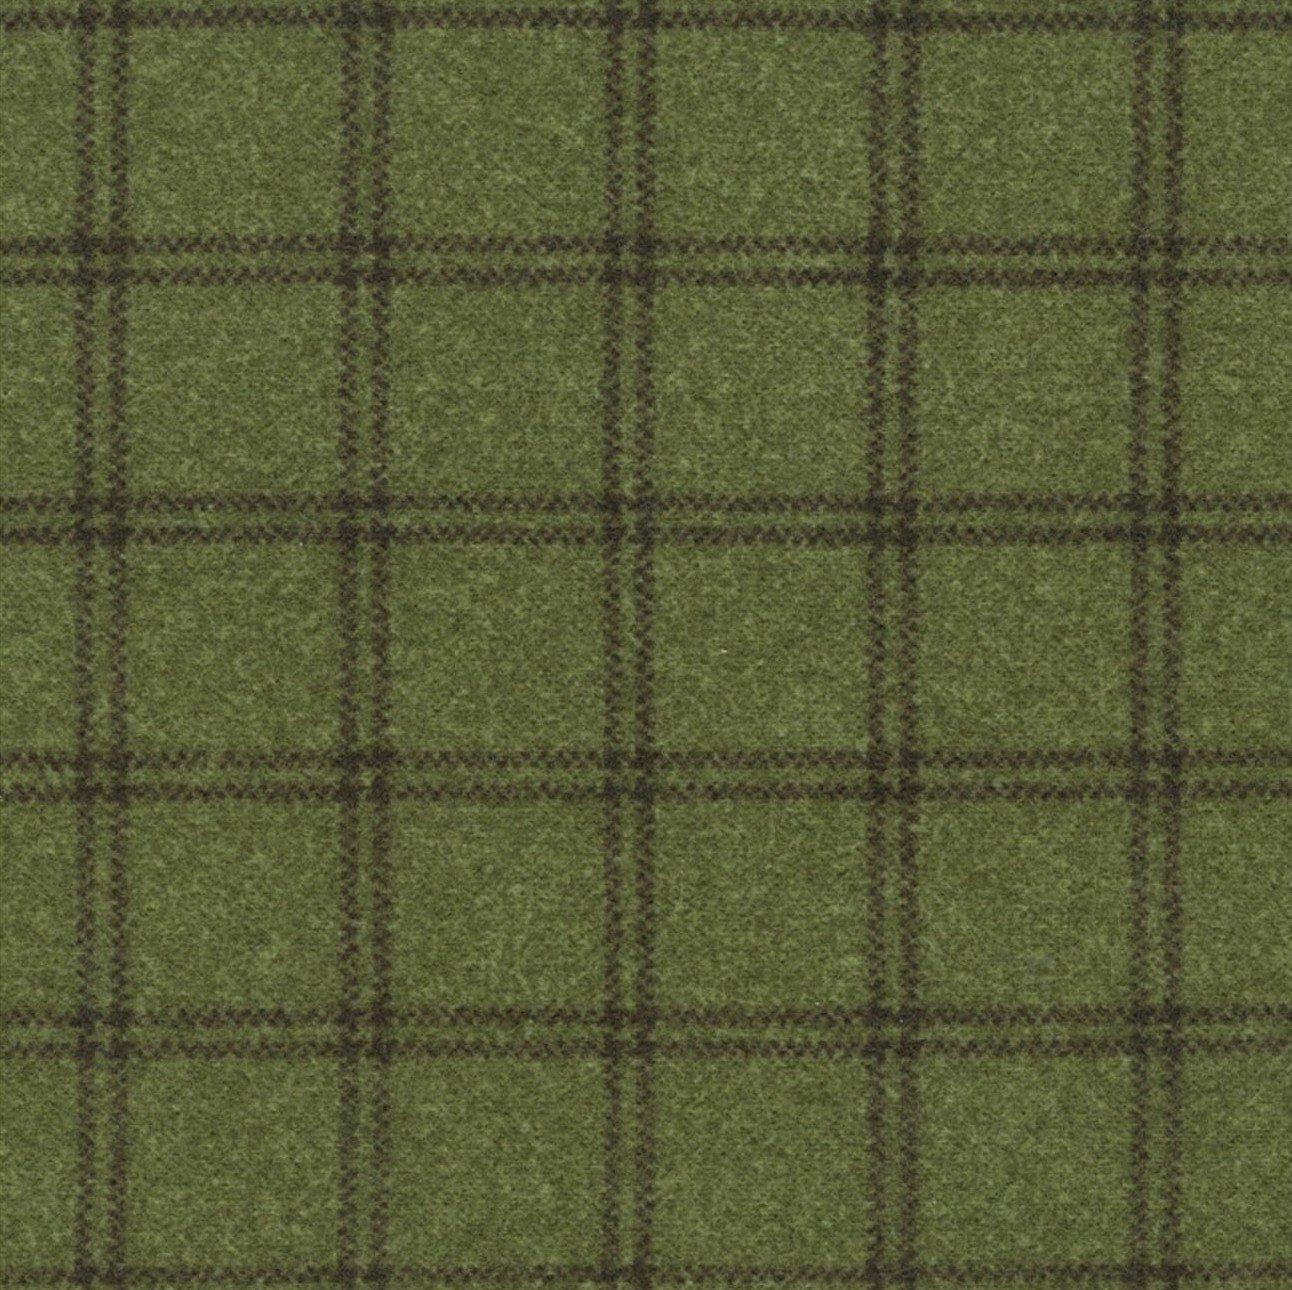 Woolies Flannel Double Windowpane Green (MASF18127-G2)